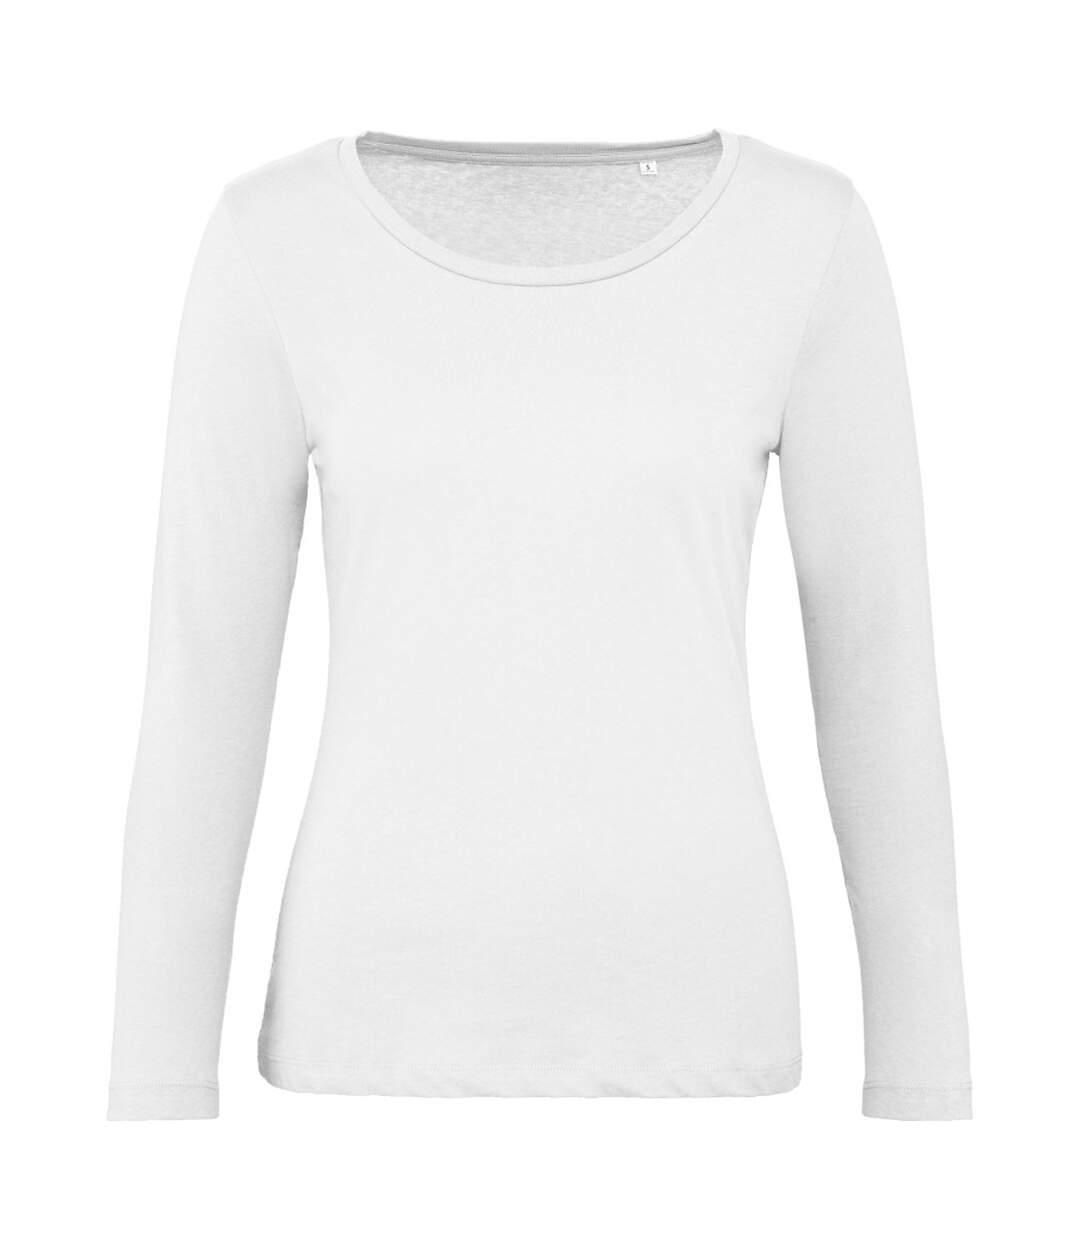 B&C - T-Shirt Manches Longues Inspire - Femme (Blanc) - UTBC4001